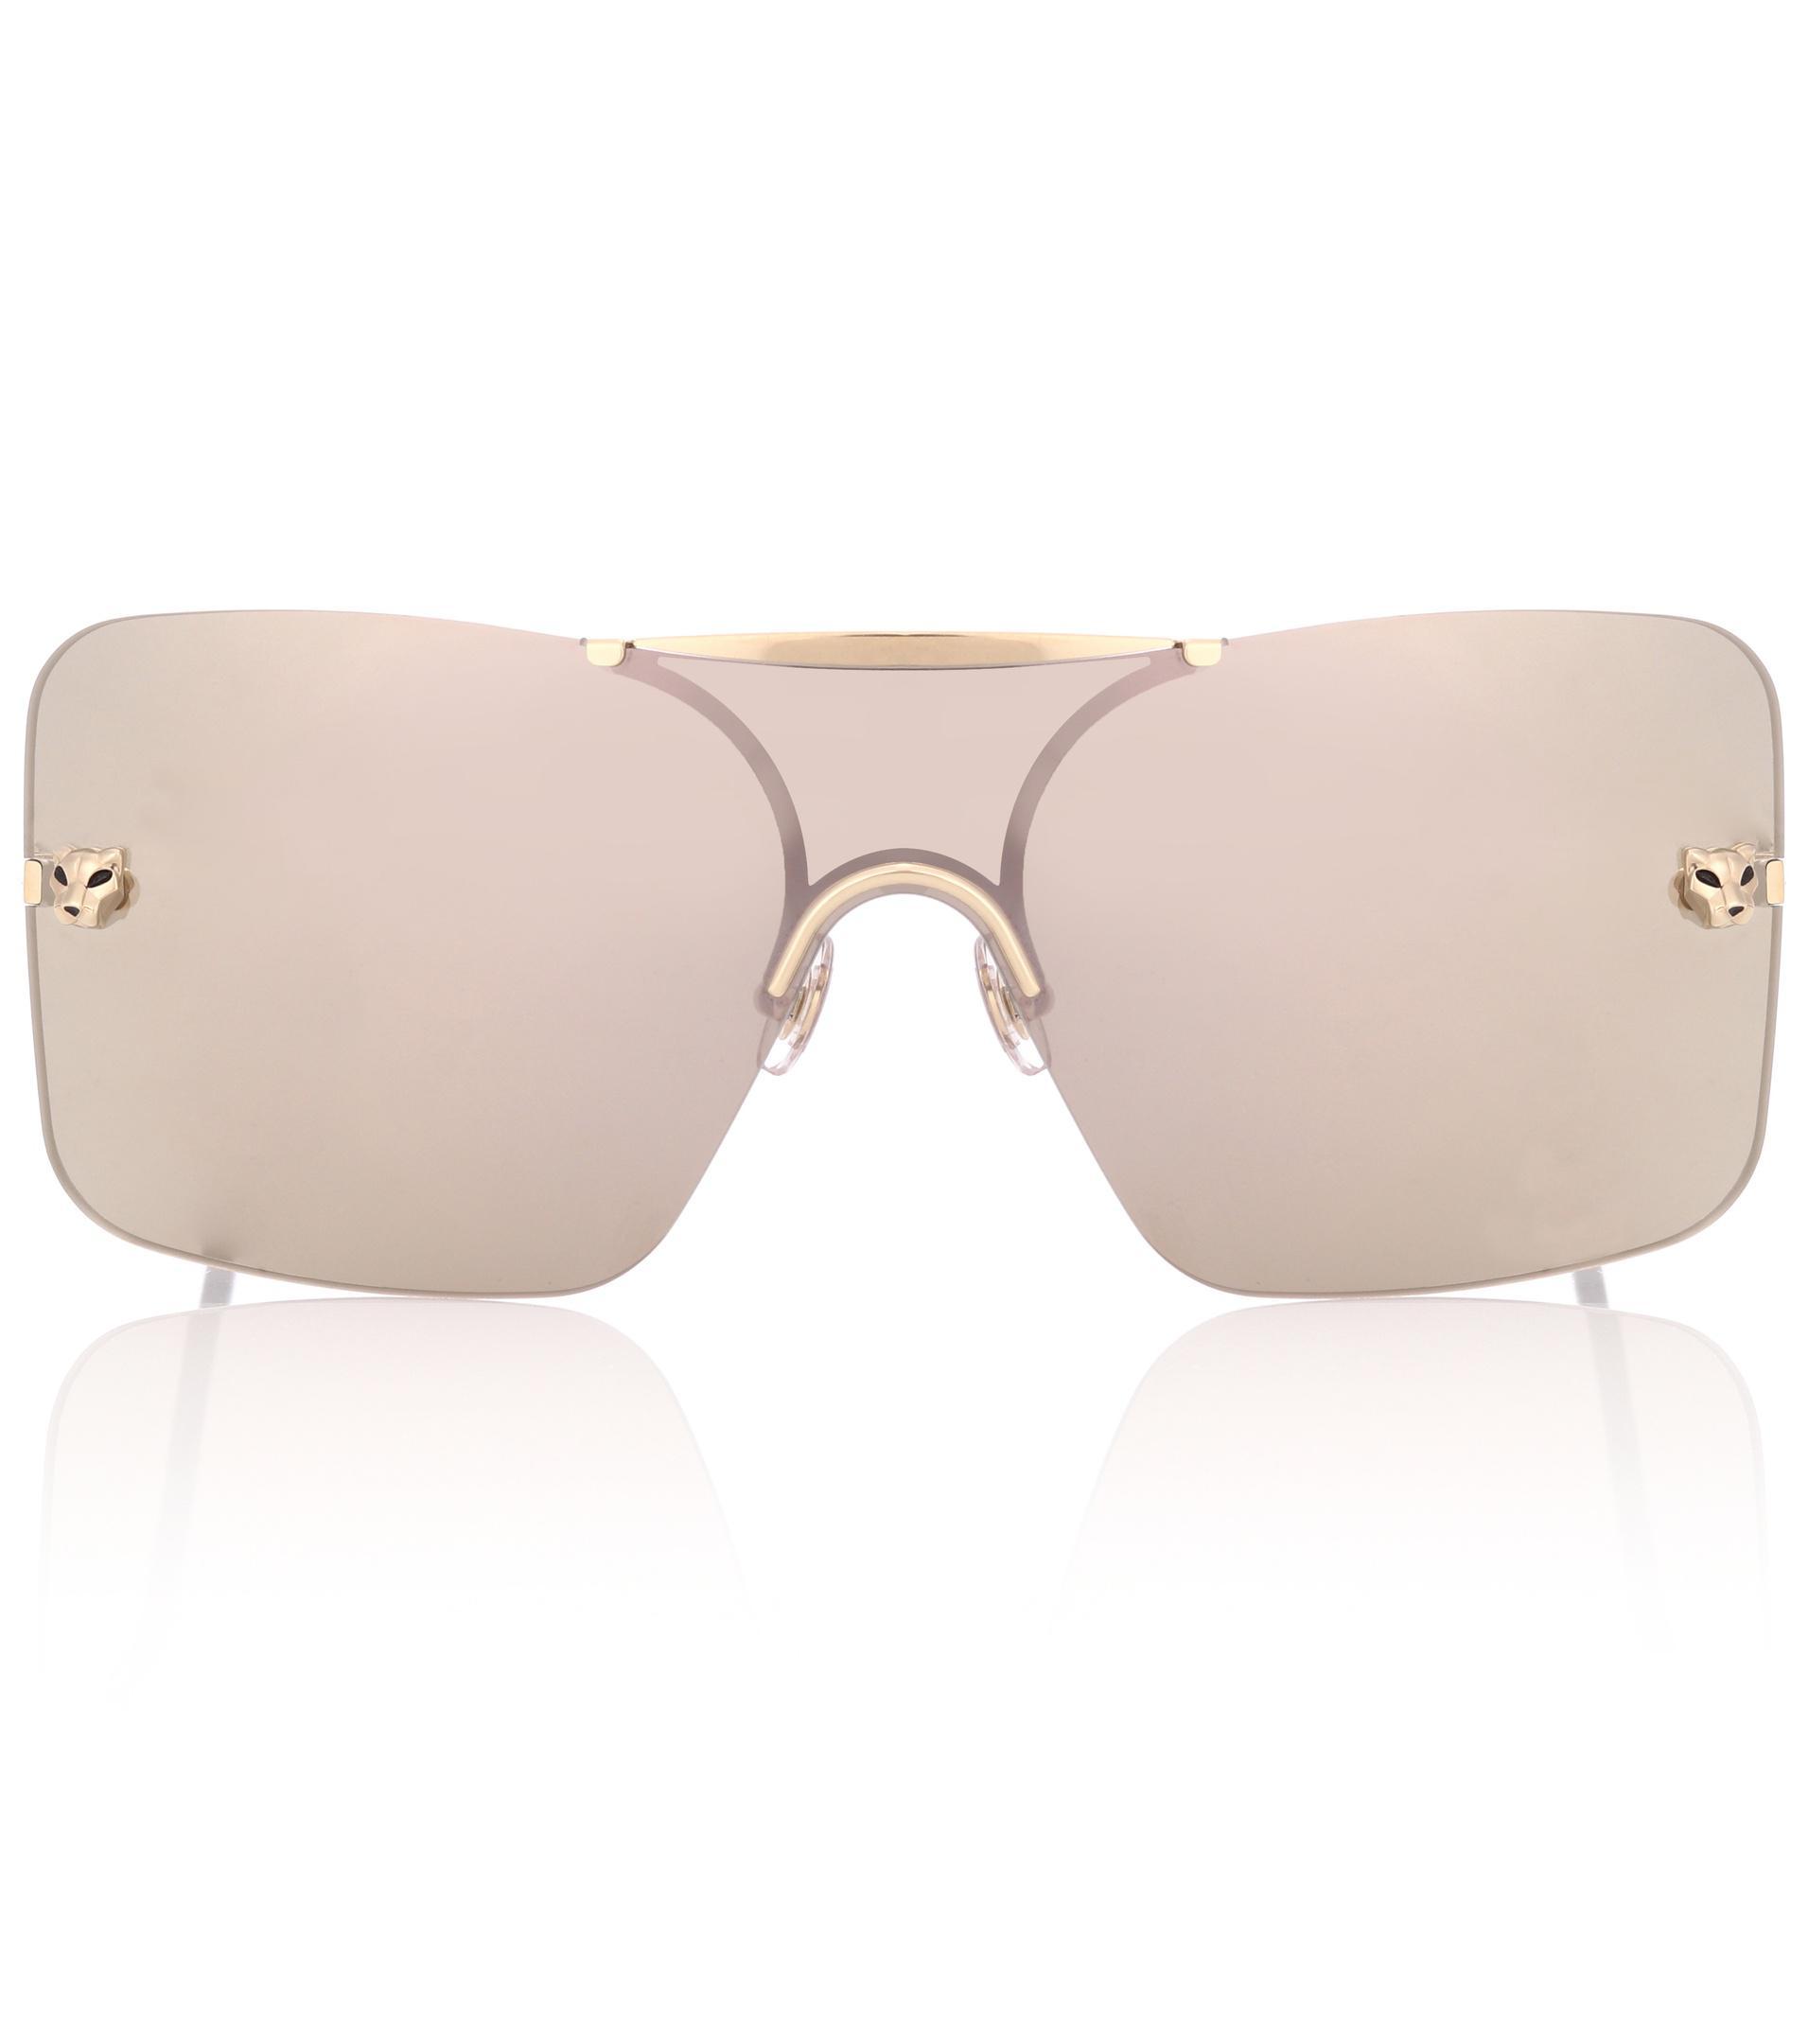 dcd0c92f4ee Cartier Panthère De Cartier Square Sunglasses in Metallic - Lyst